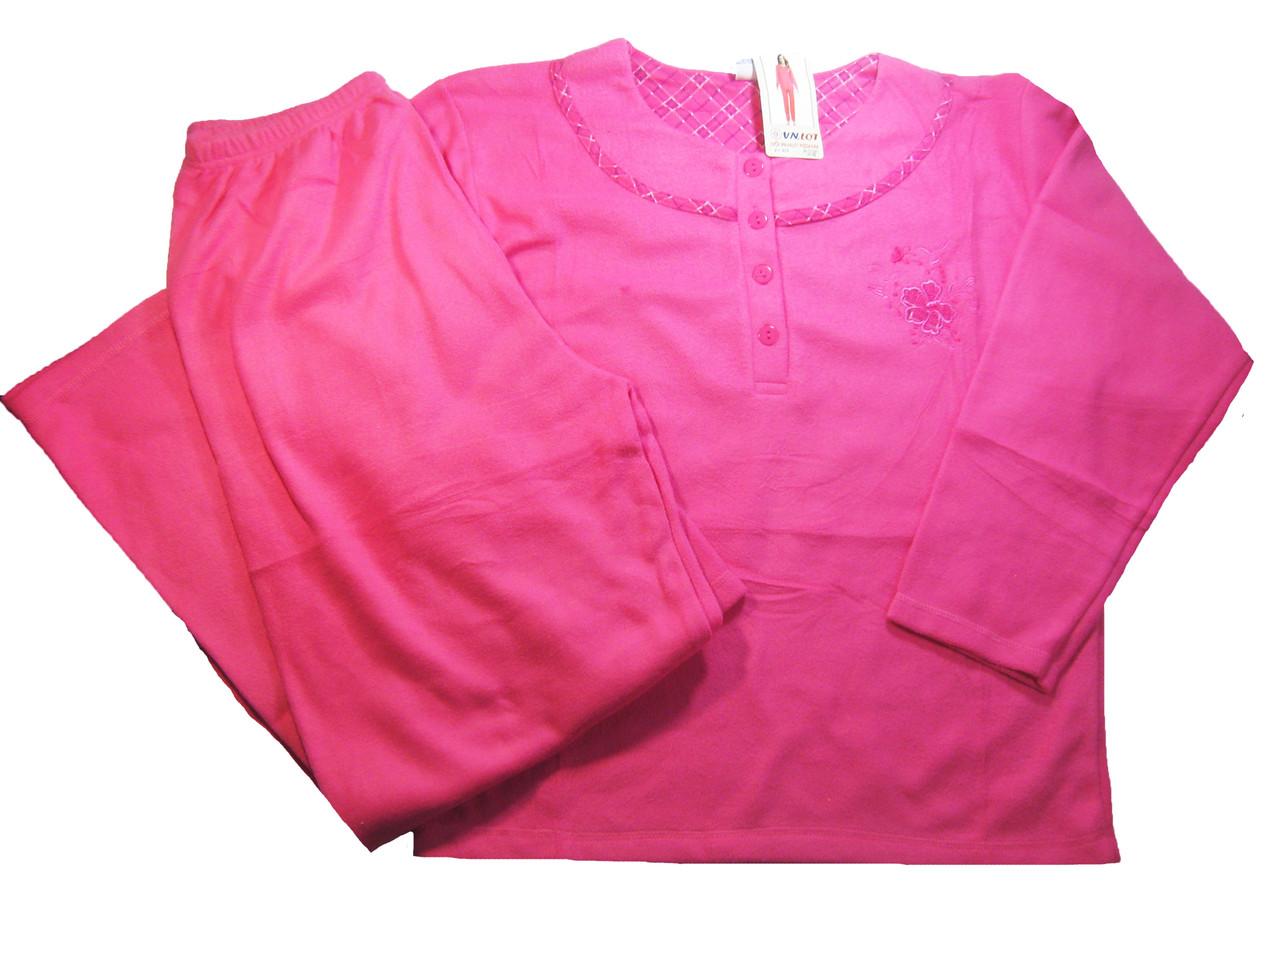 Пижама женская флисовая, размеры М-ХЛ, арт. 920